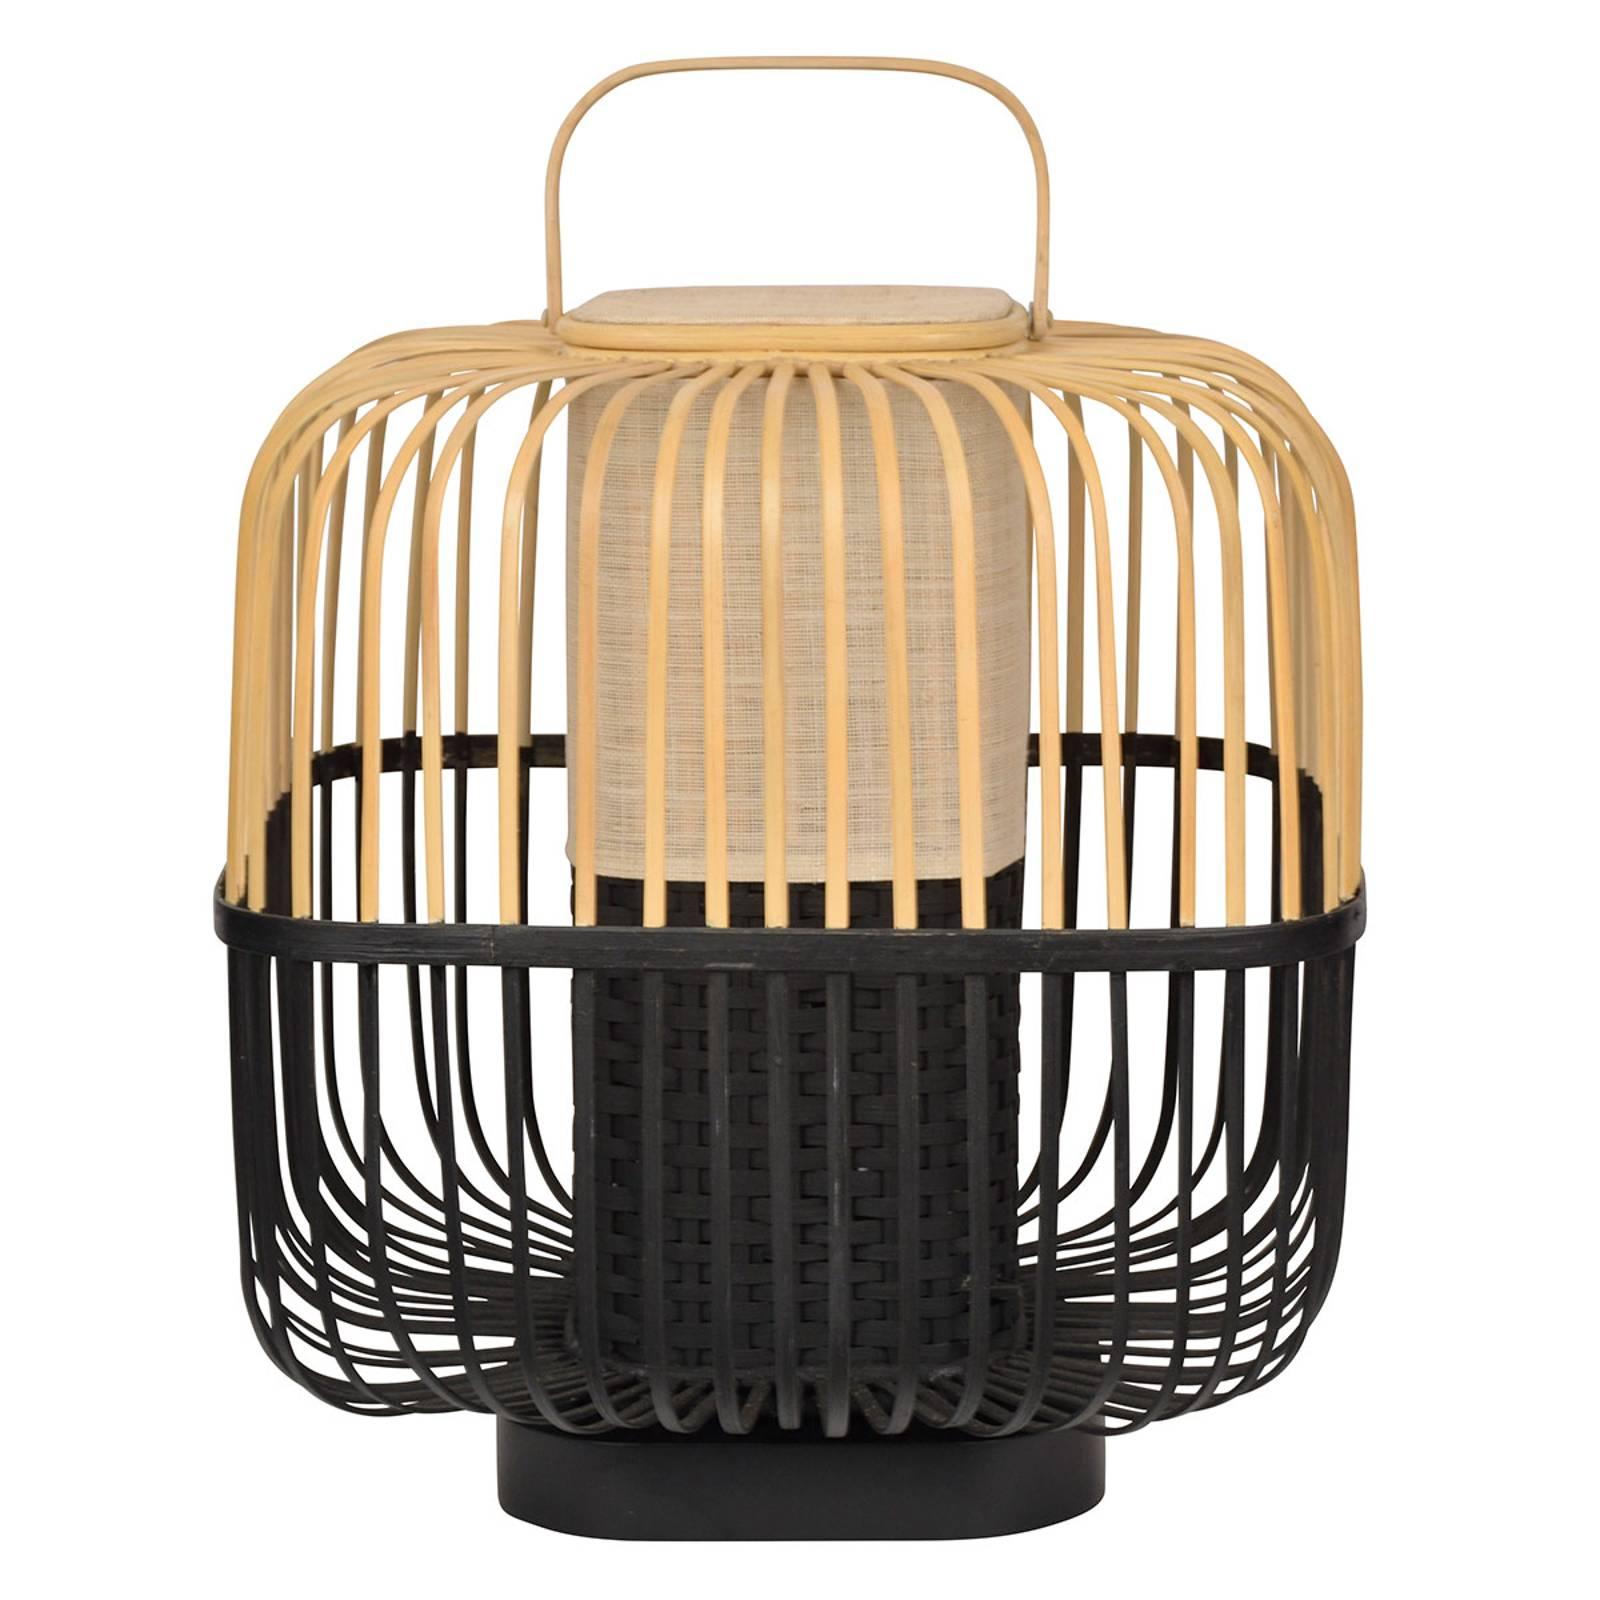 Forestier Bamboo Square M tafellamp in zwart